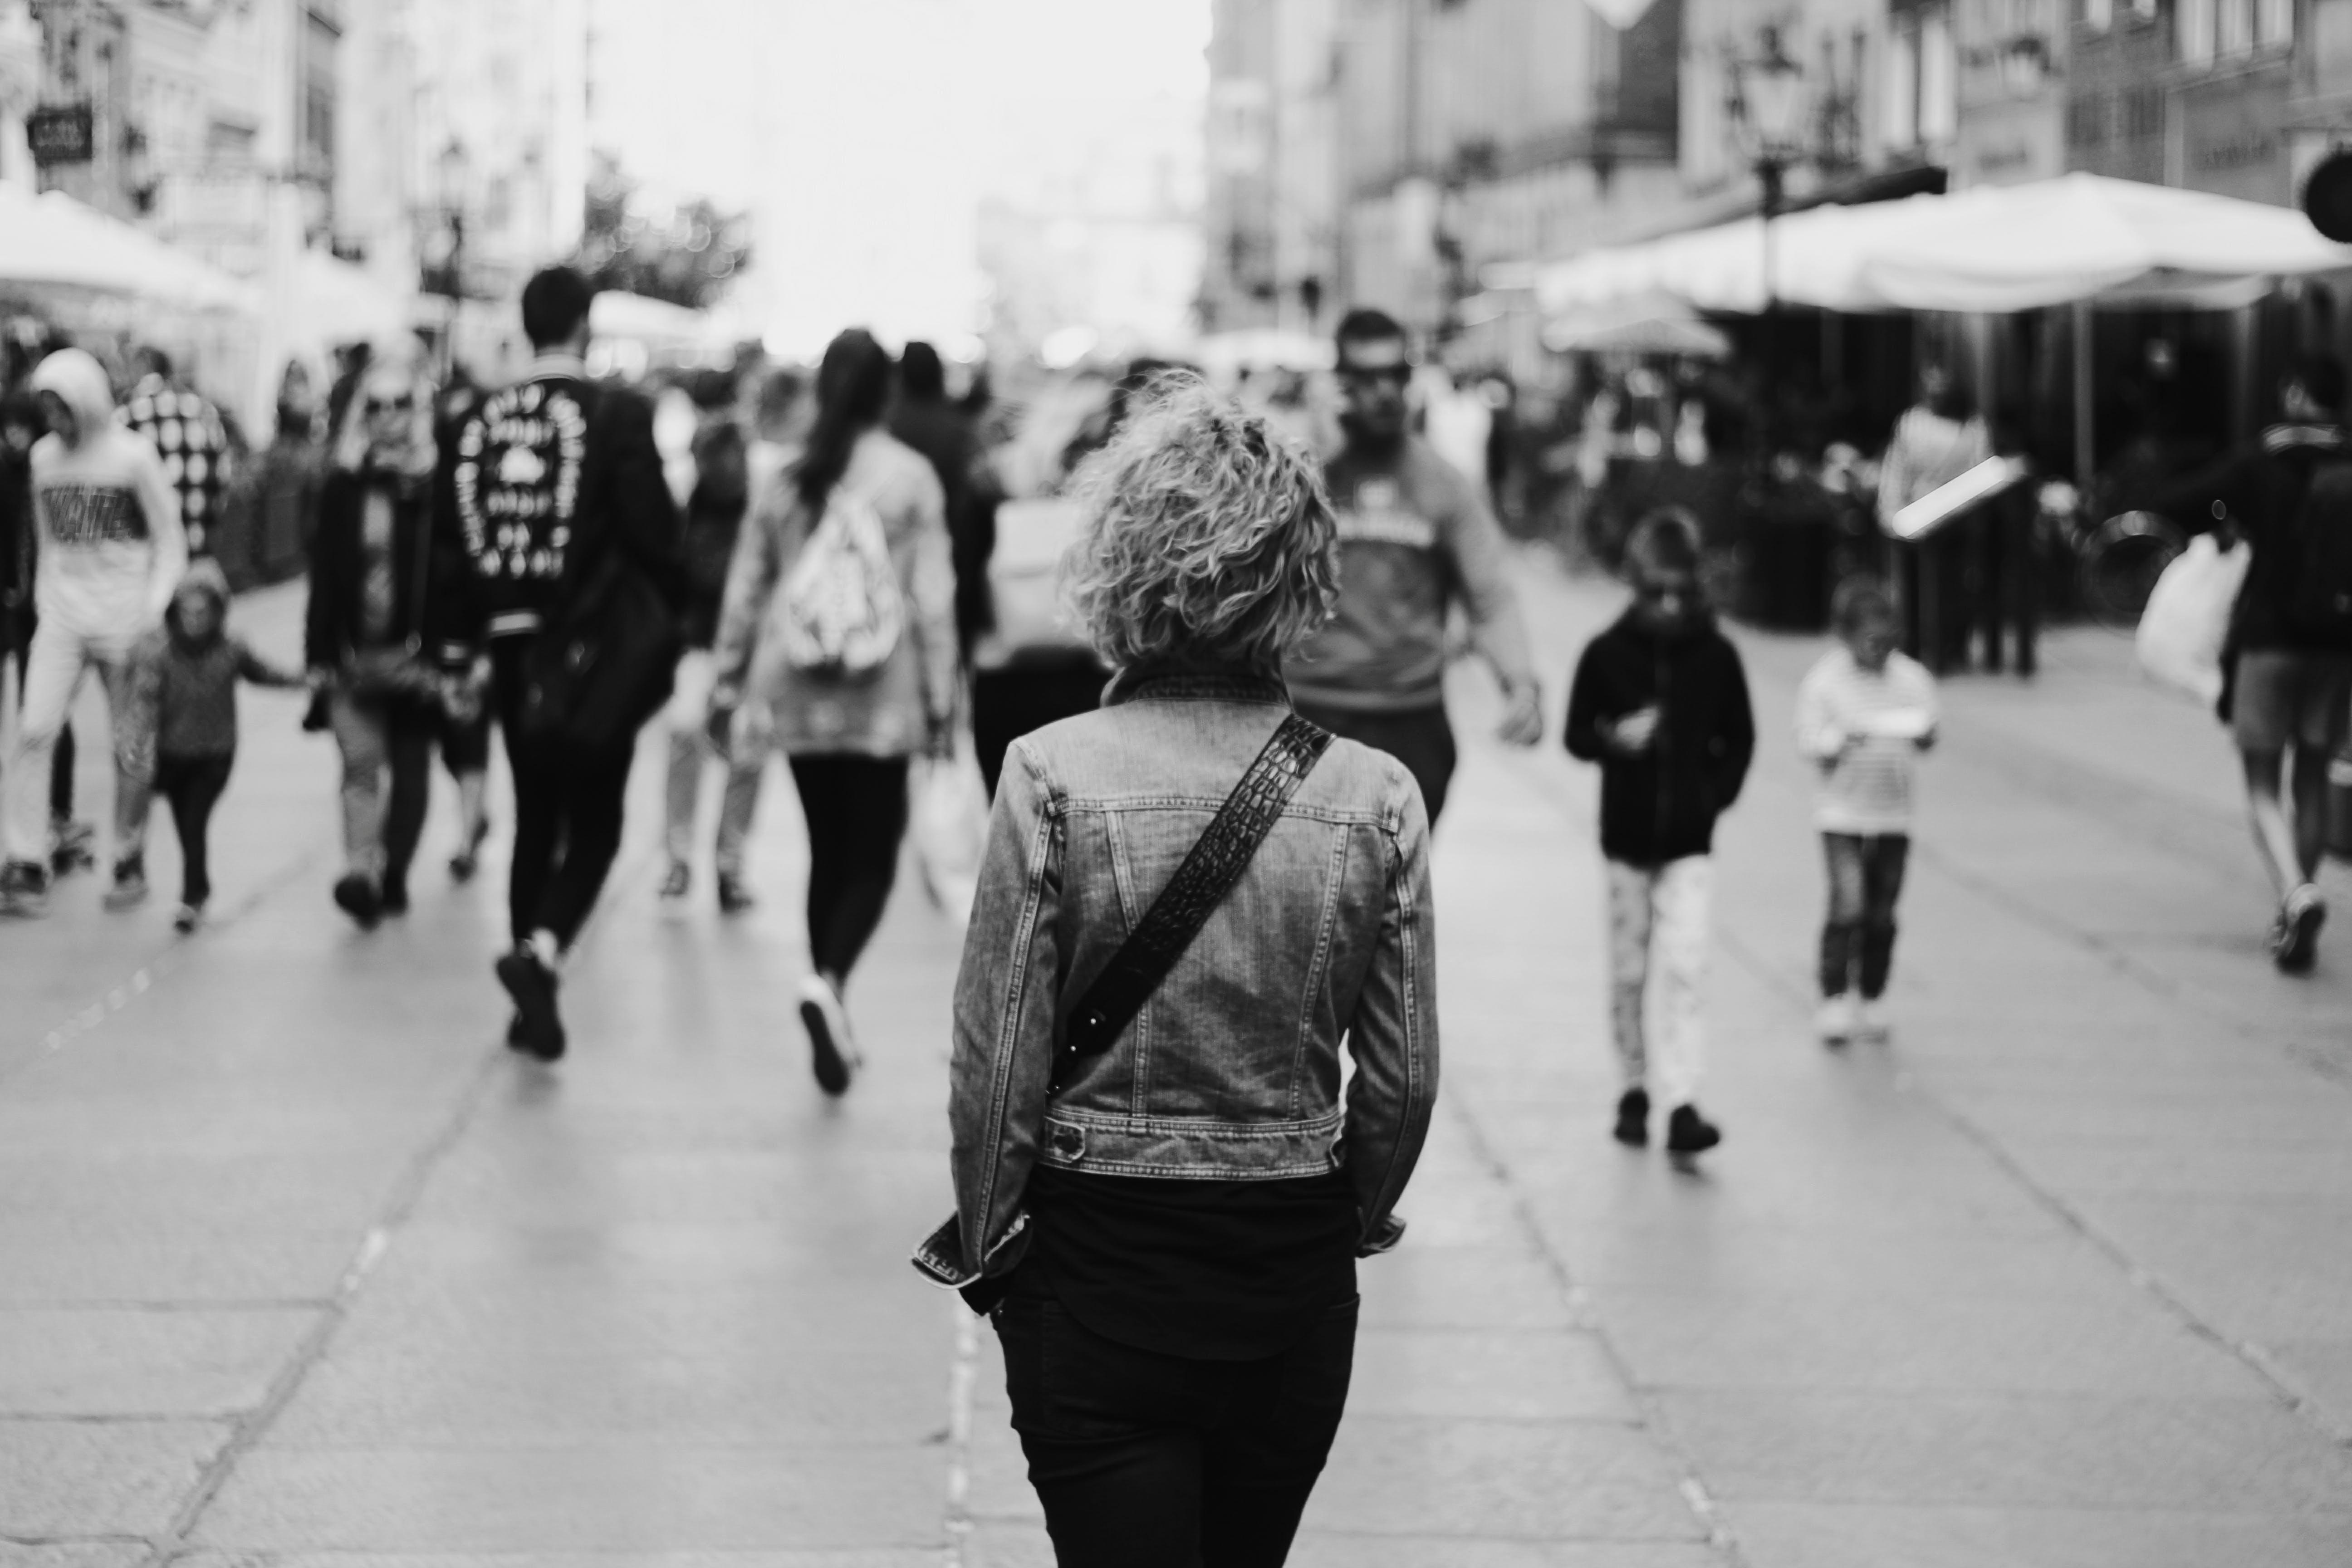 Grayscale Photo Of Woman Walking